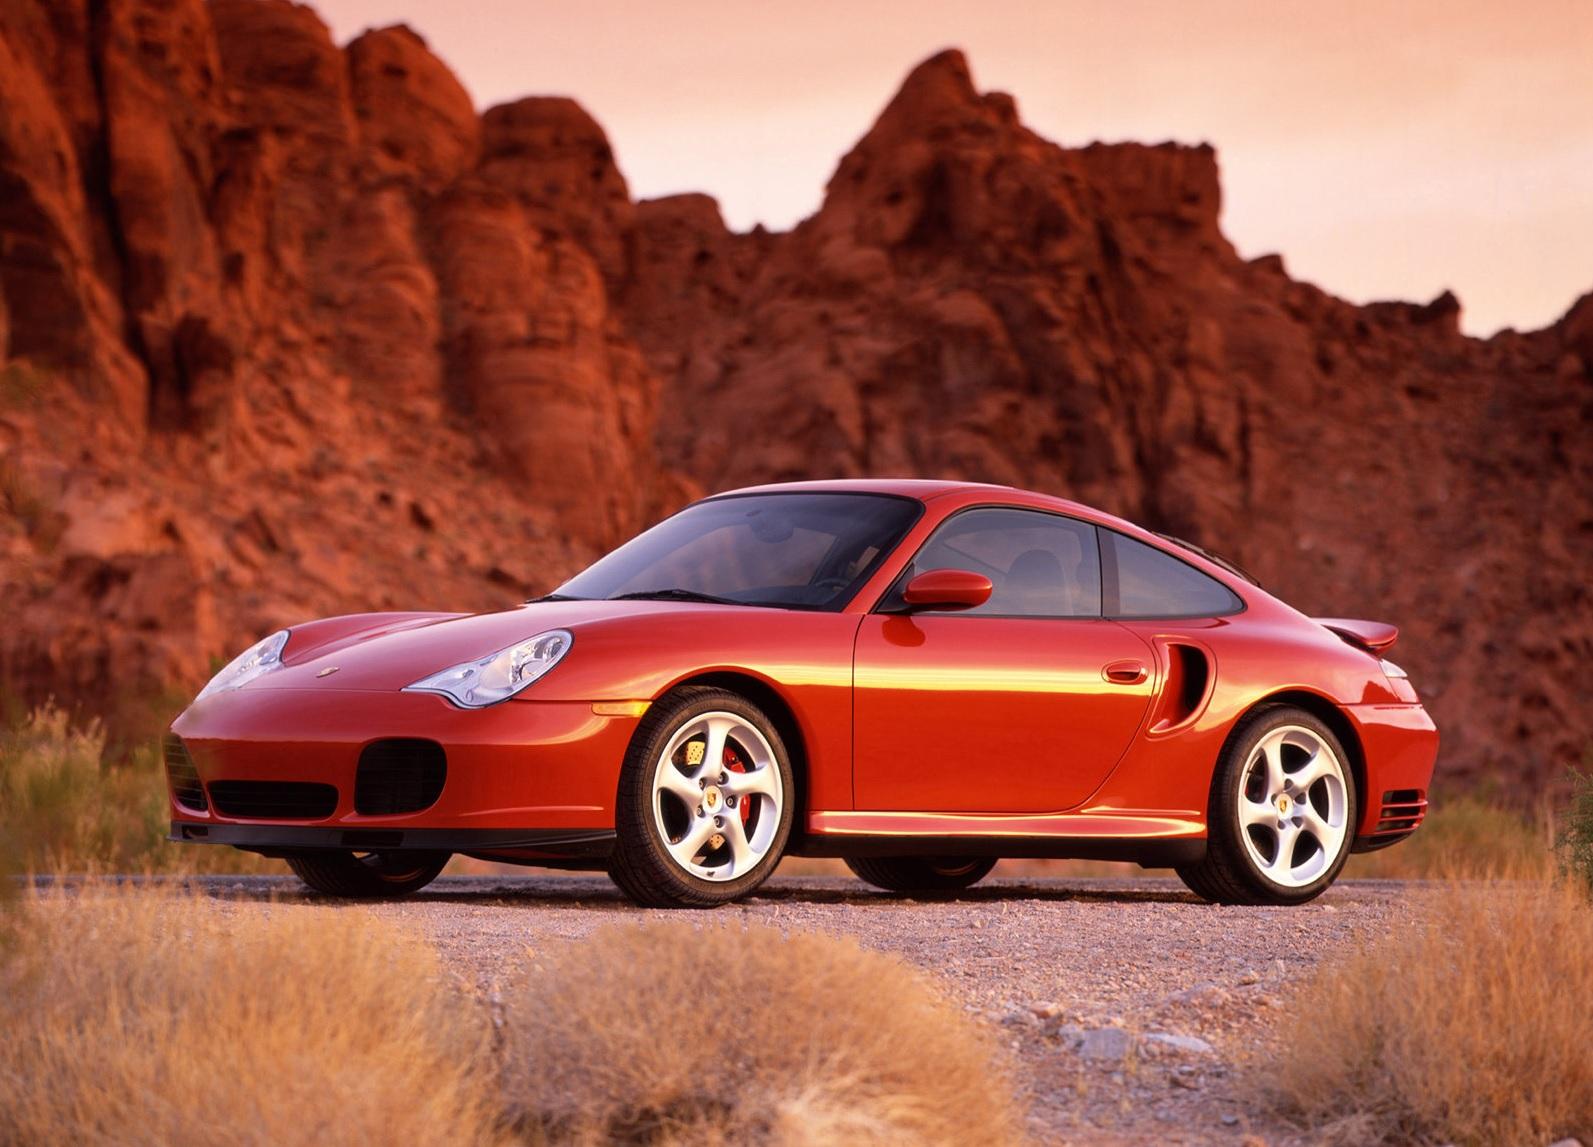 2003 Porsche 911 996 Turbo